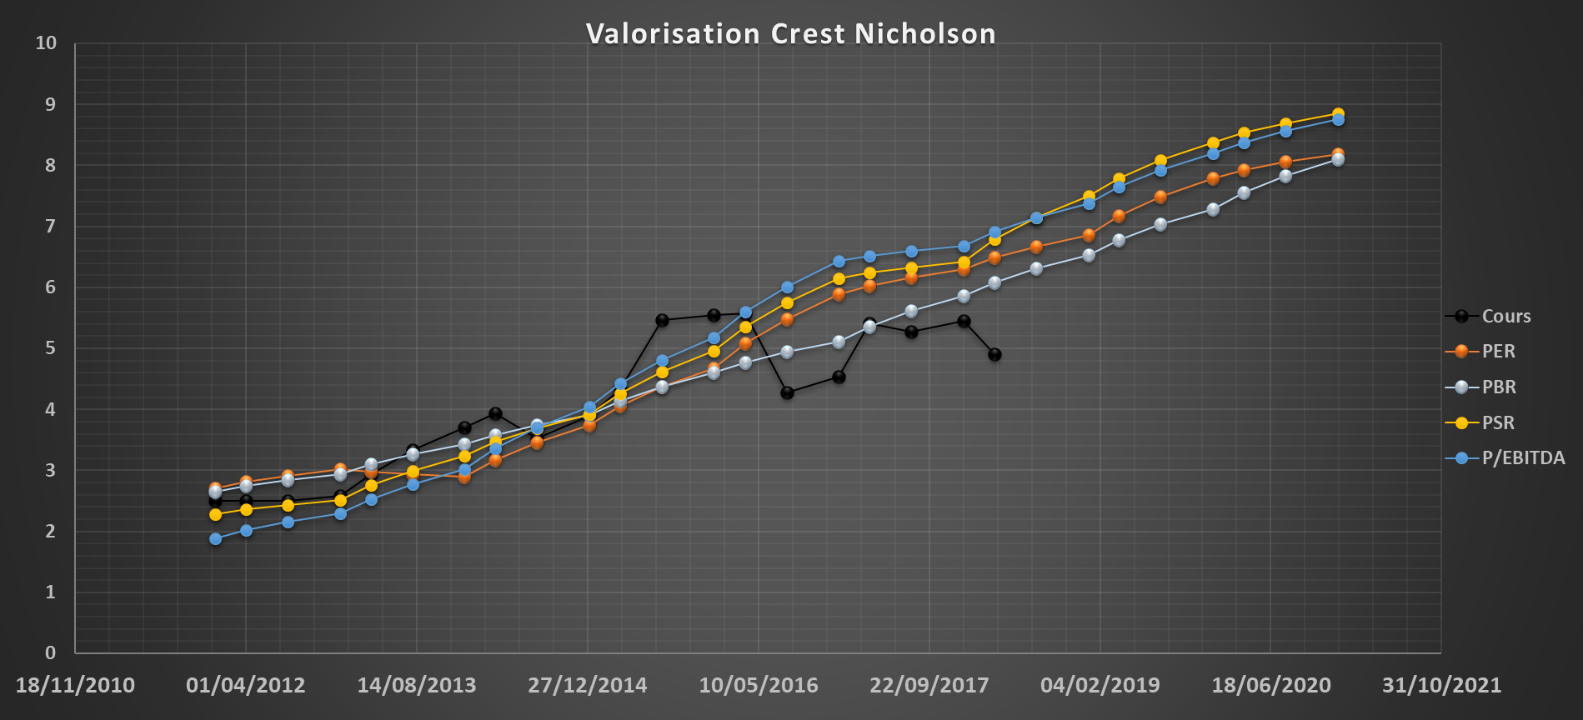 analyse action acheter bourse Crest Nicholson valorisation